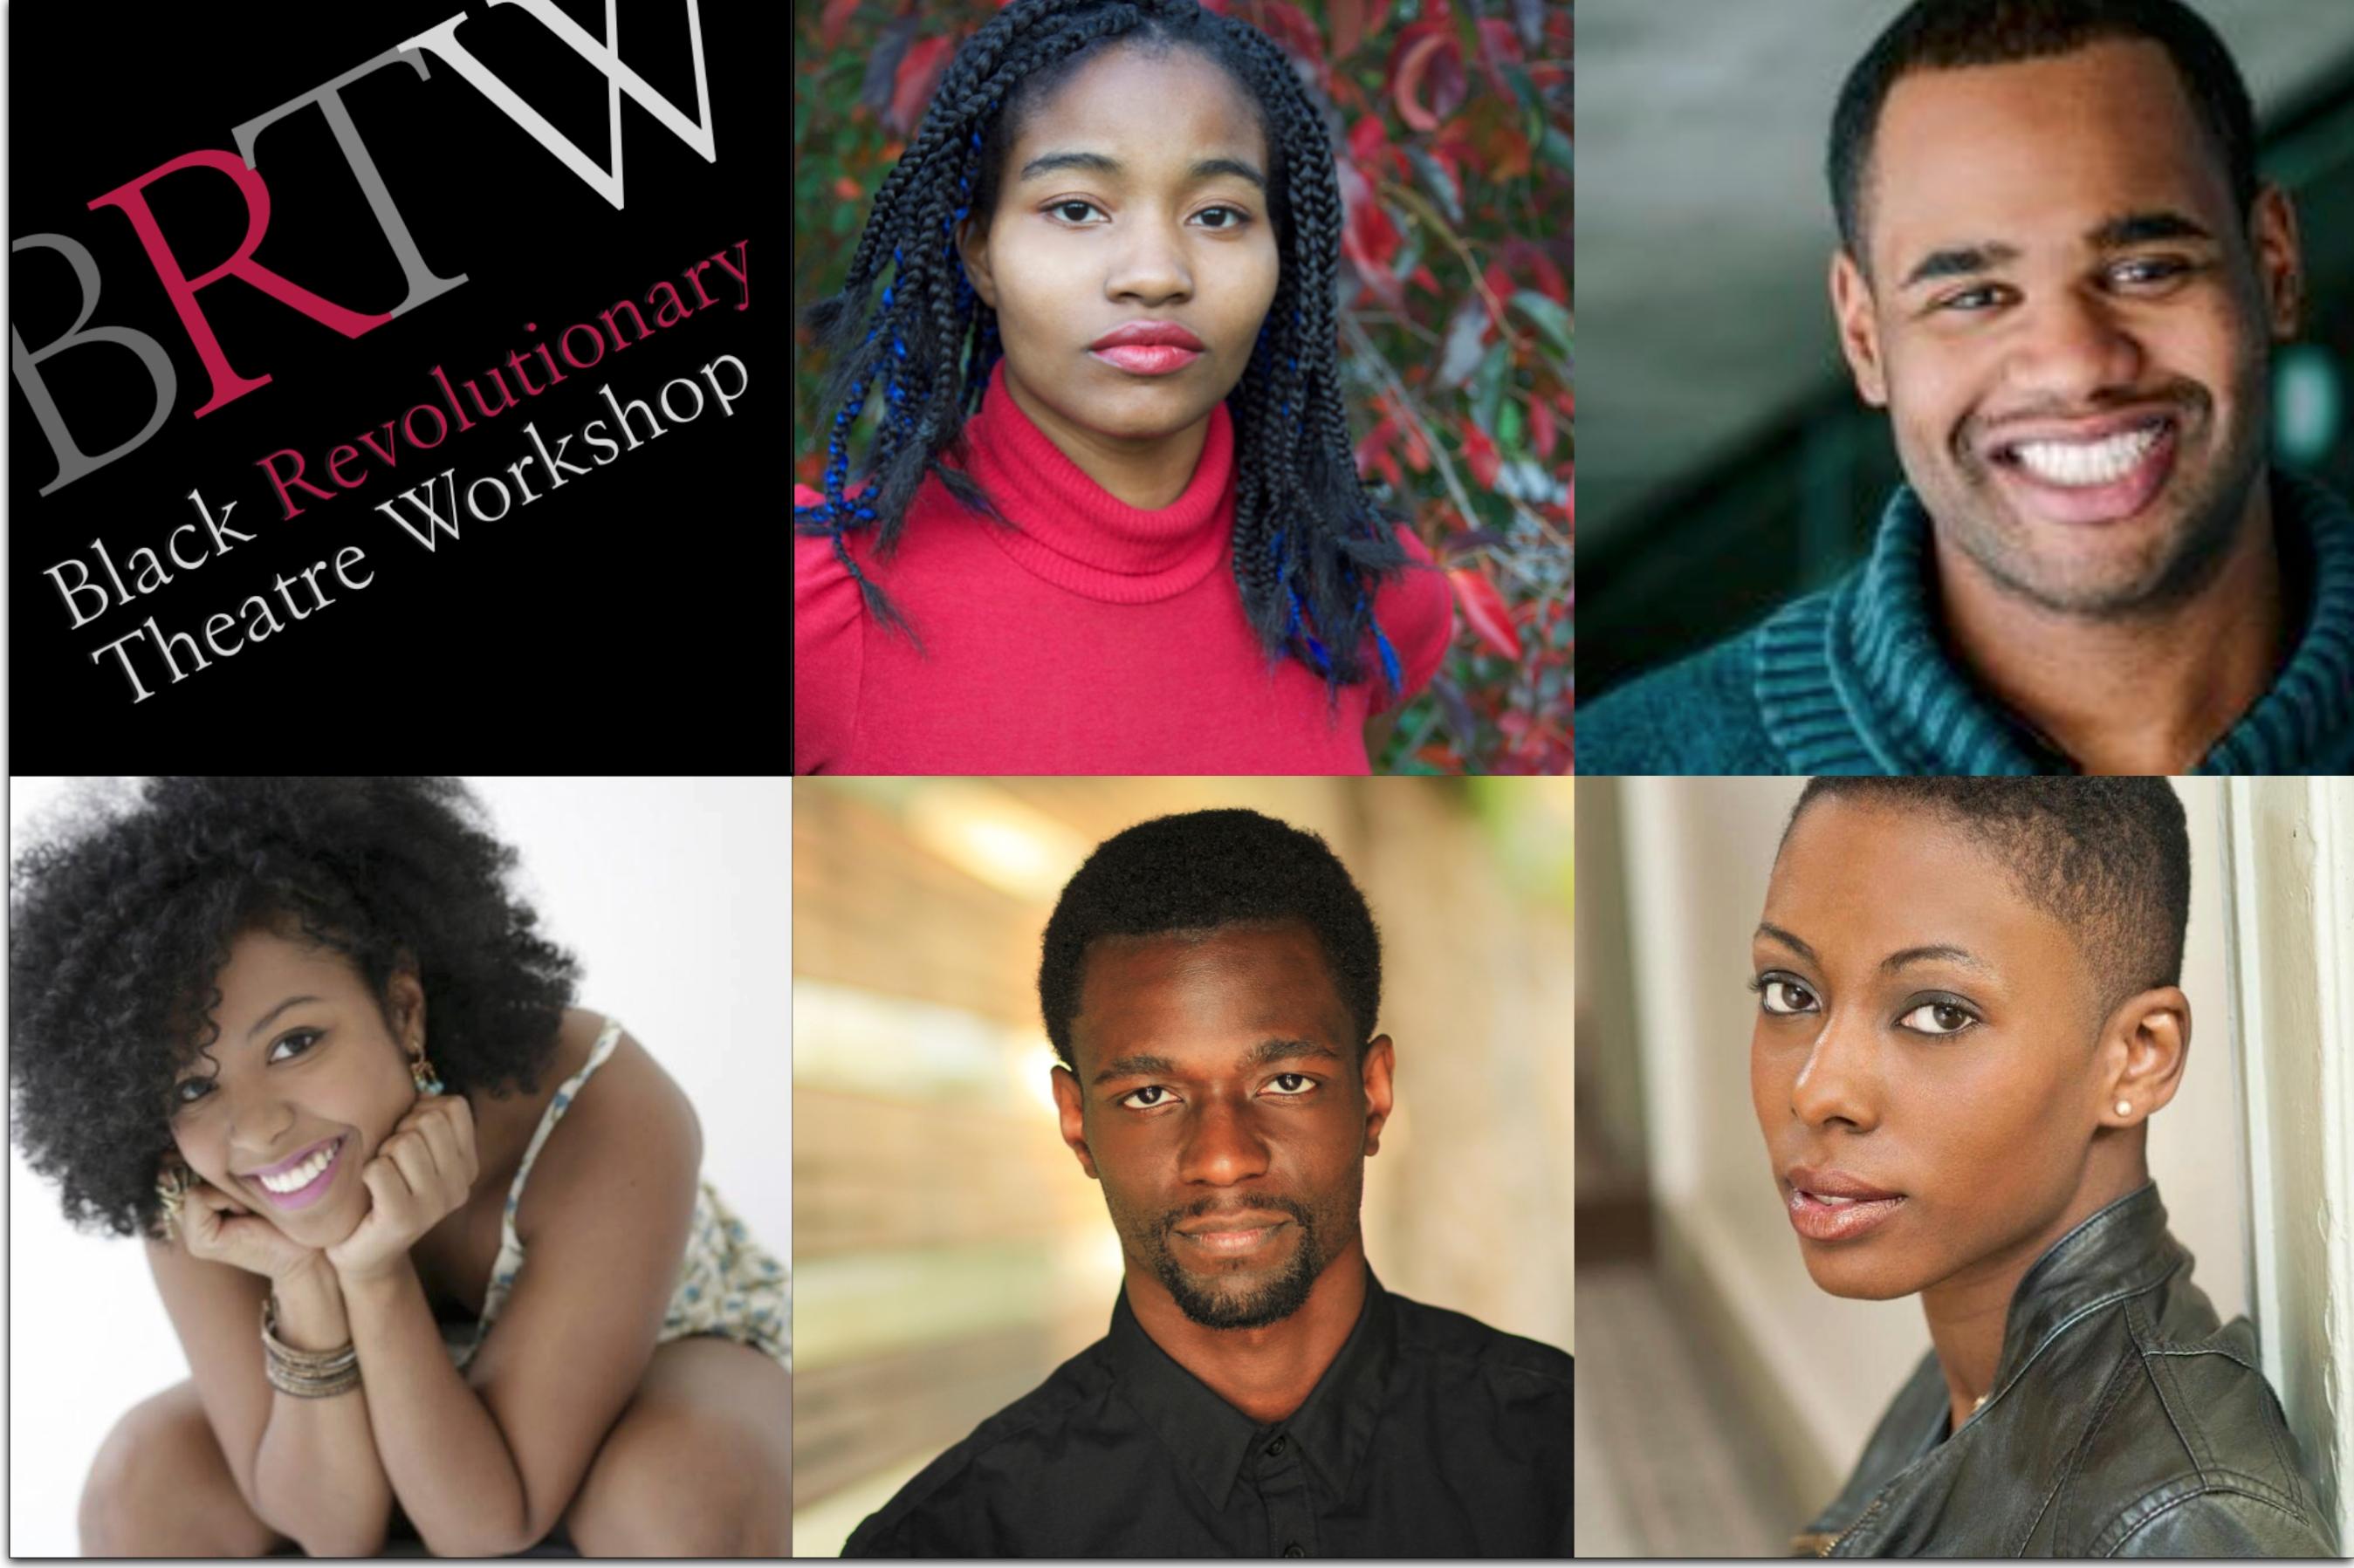 Black Revolutionary Theatre Workshop Membership